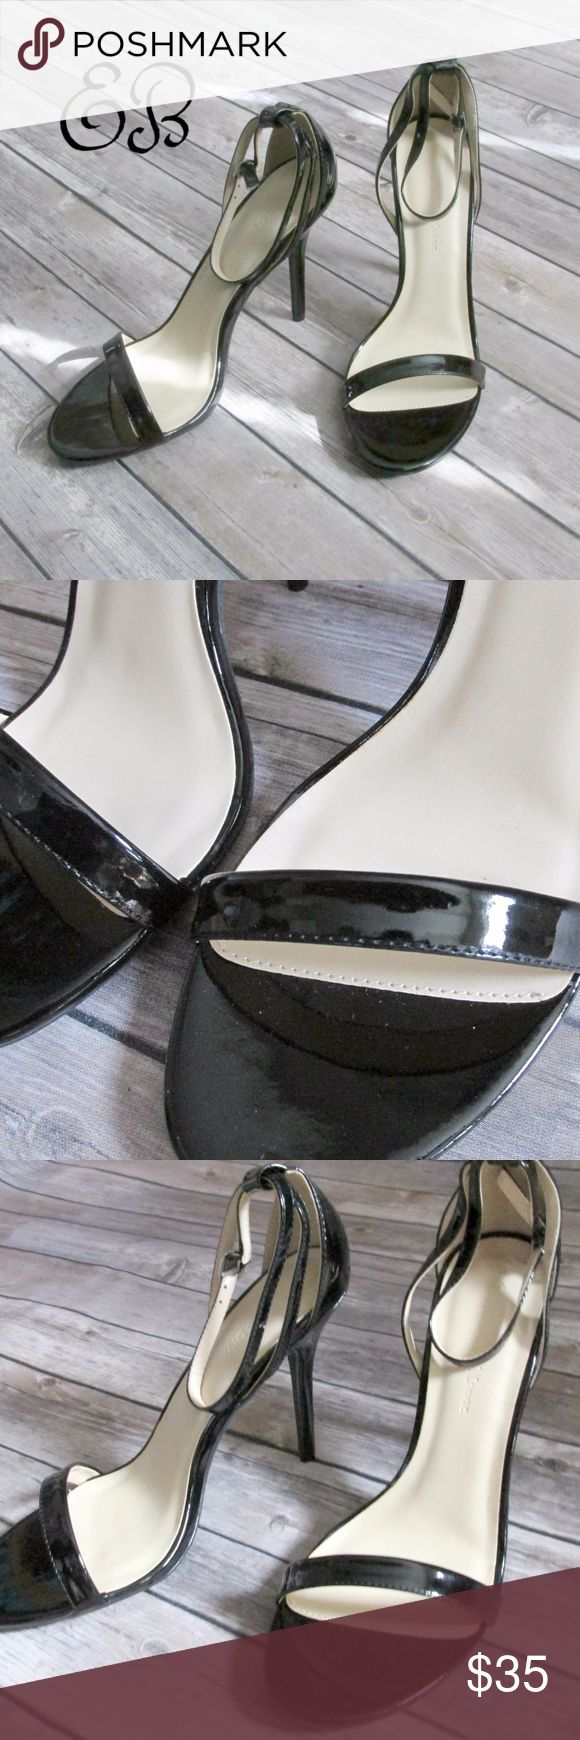 "WILD DIVA Lounge Adele Black Stilettos Size 10 Wild Diva Lounge Adele Black Stilettos Size 10  Condition: New In Box Brand: Wild Diva Lounge Type: Sandal Style: Stiletto  Color: Black  Size: 10 Heel Height: 4.5"" Materials: Vegan Leather  DD 14.7.17 Wild Diva Shoes Heels"